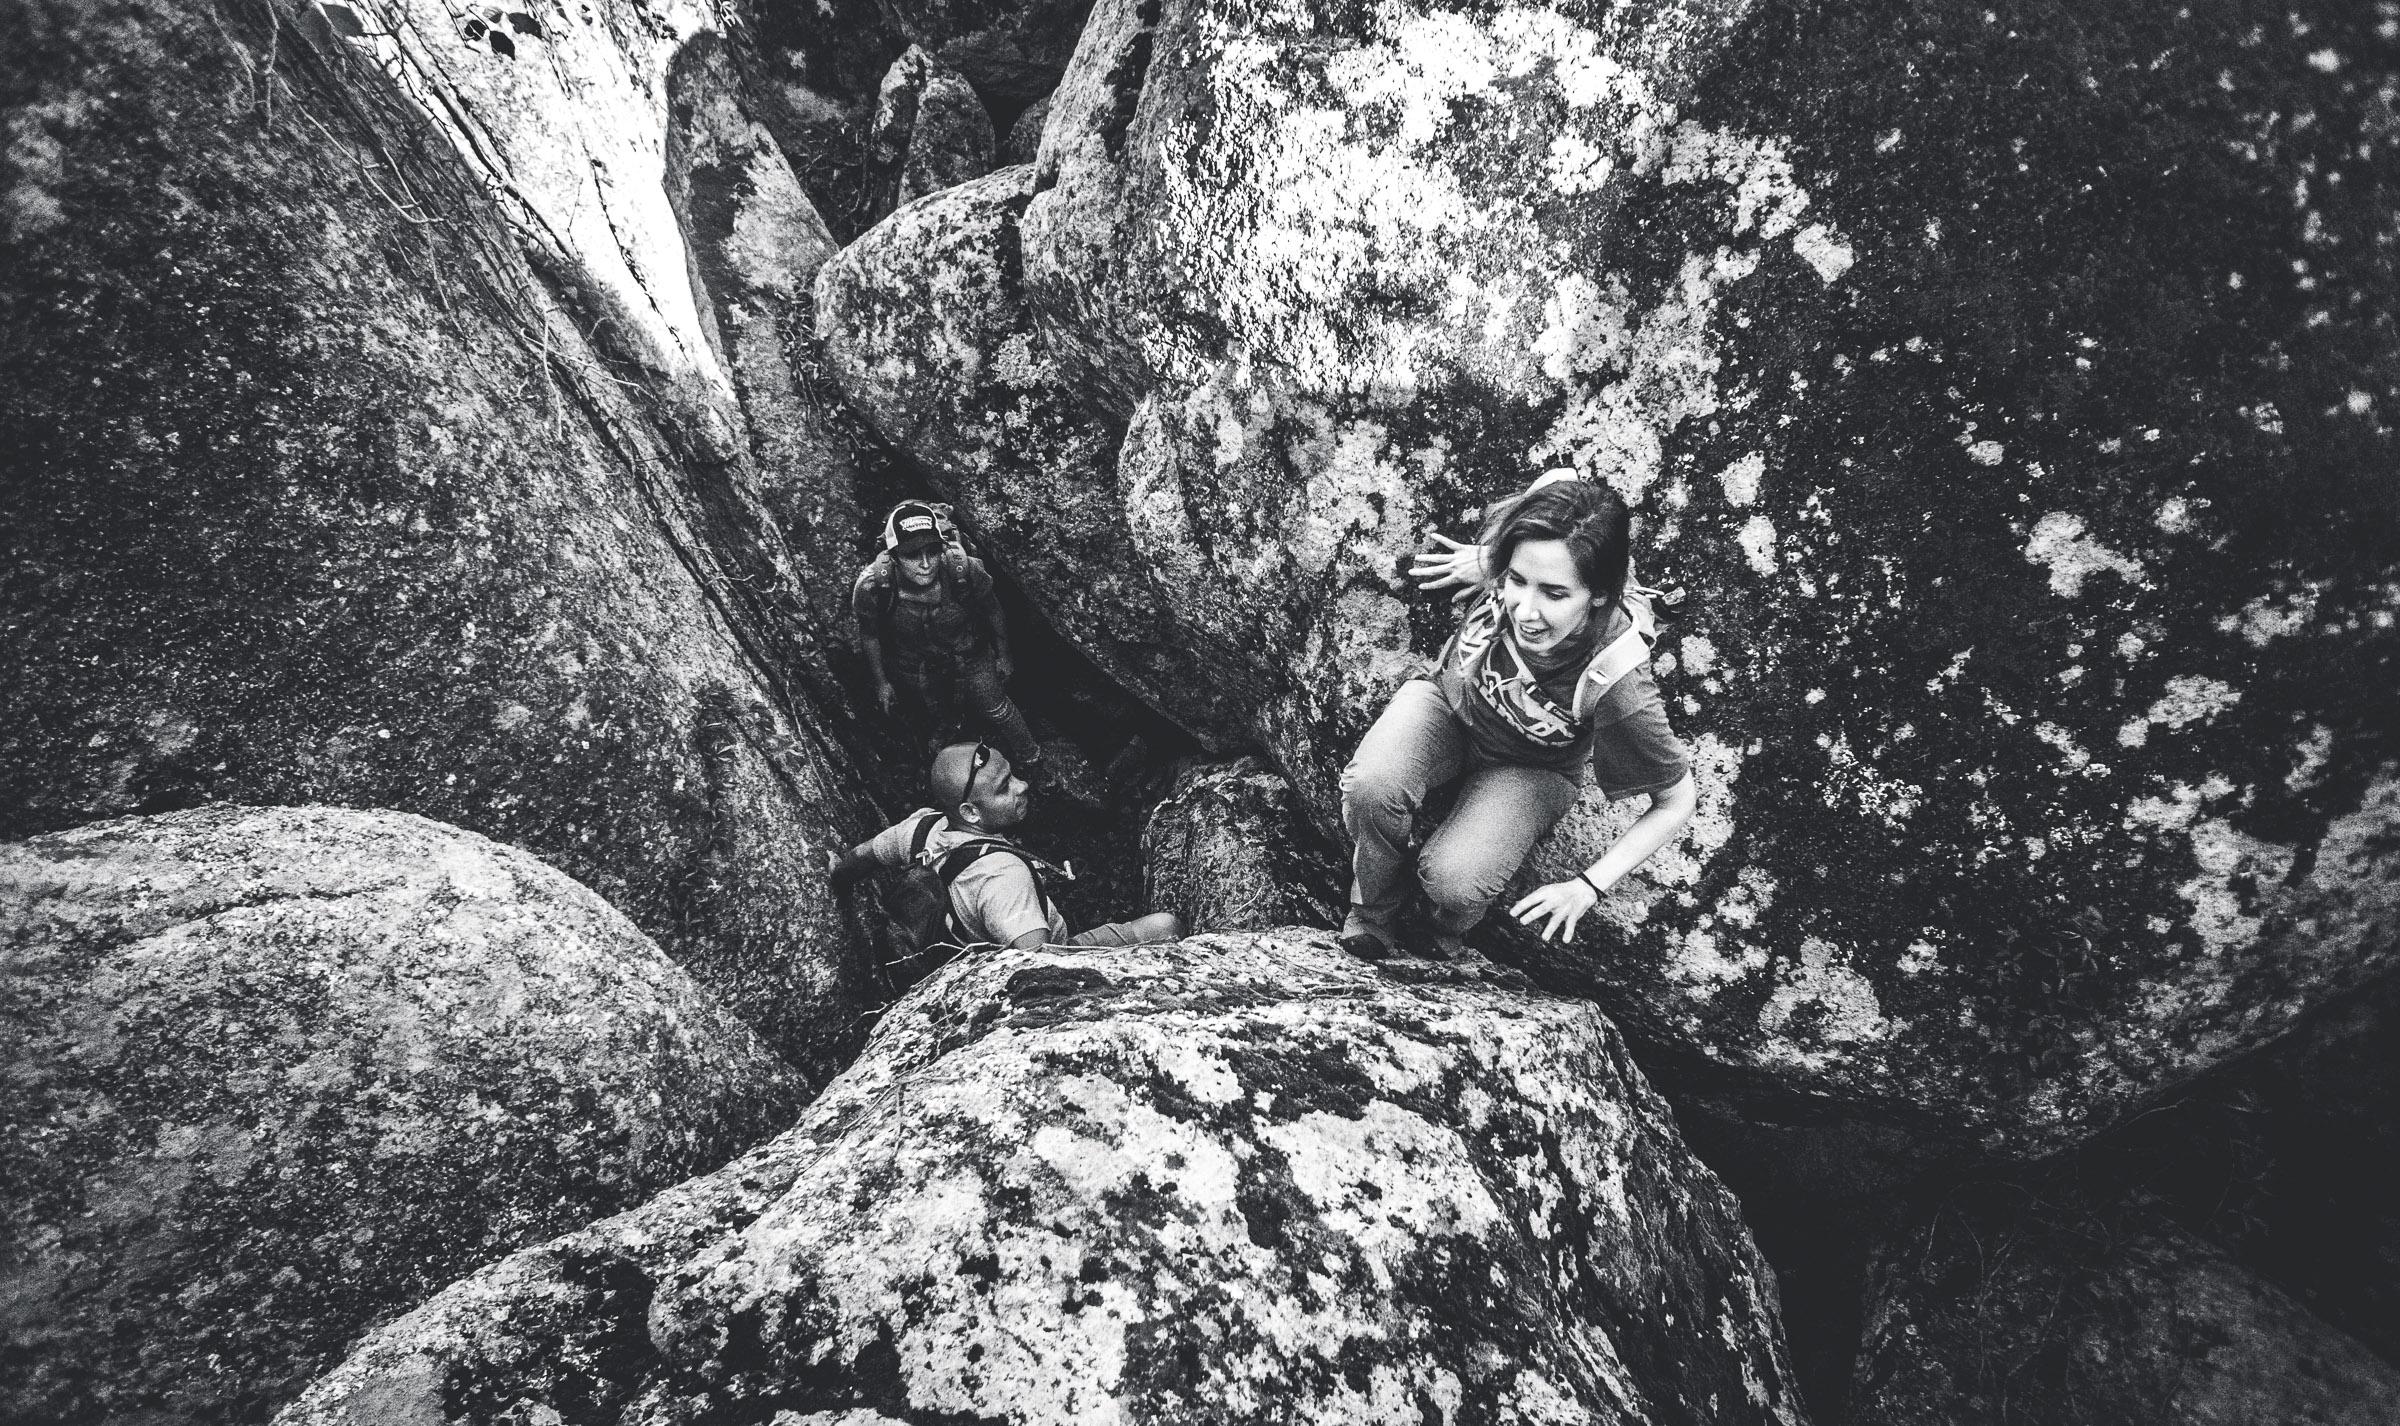 Spanish Cave 11-12-16 B&W (27 of 33).JPG